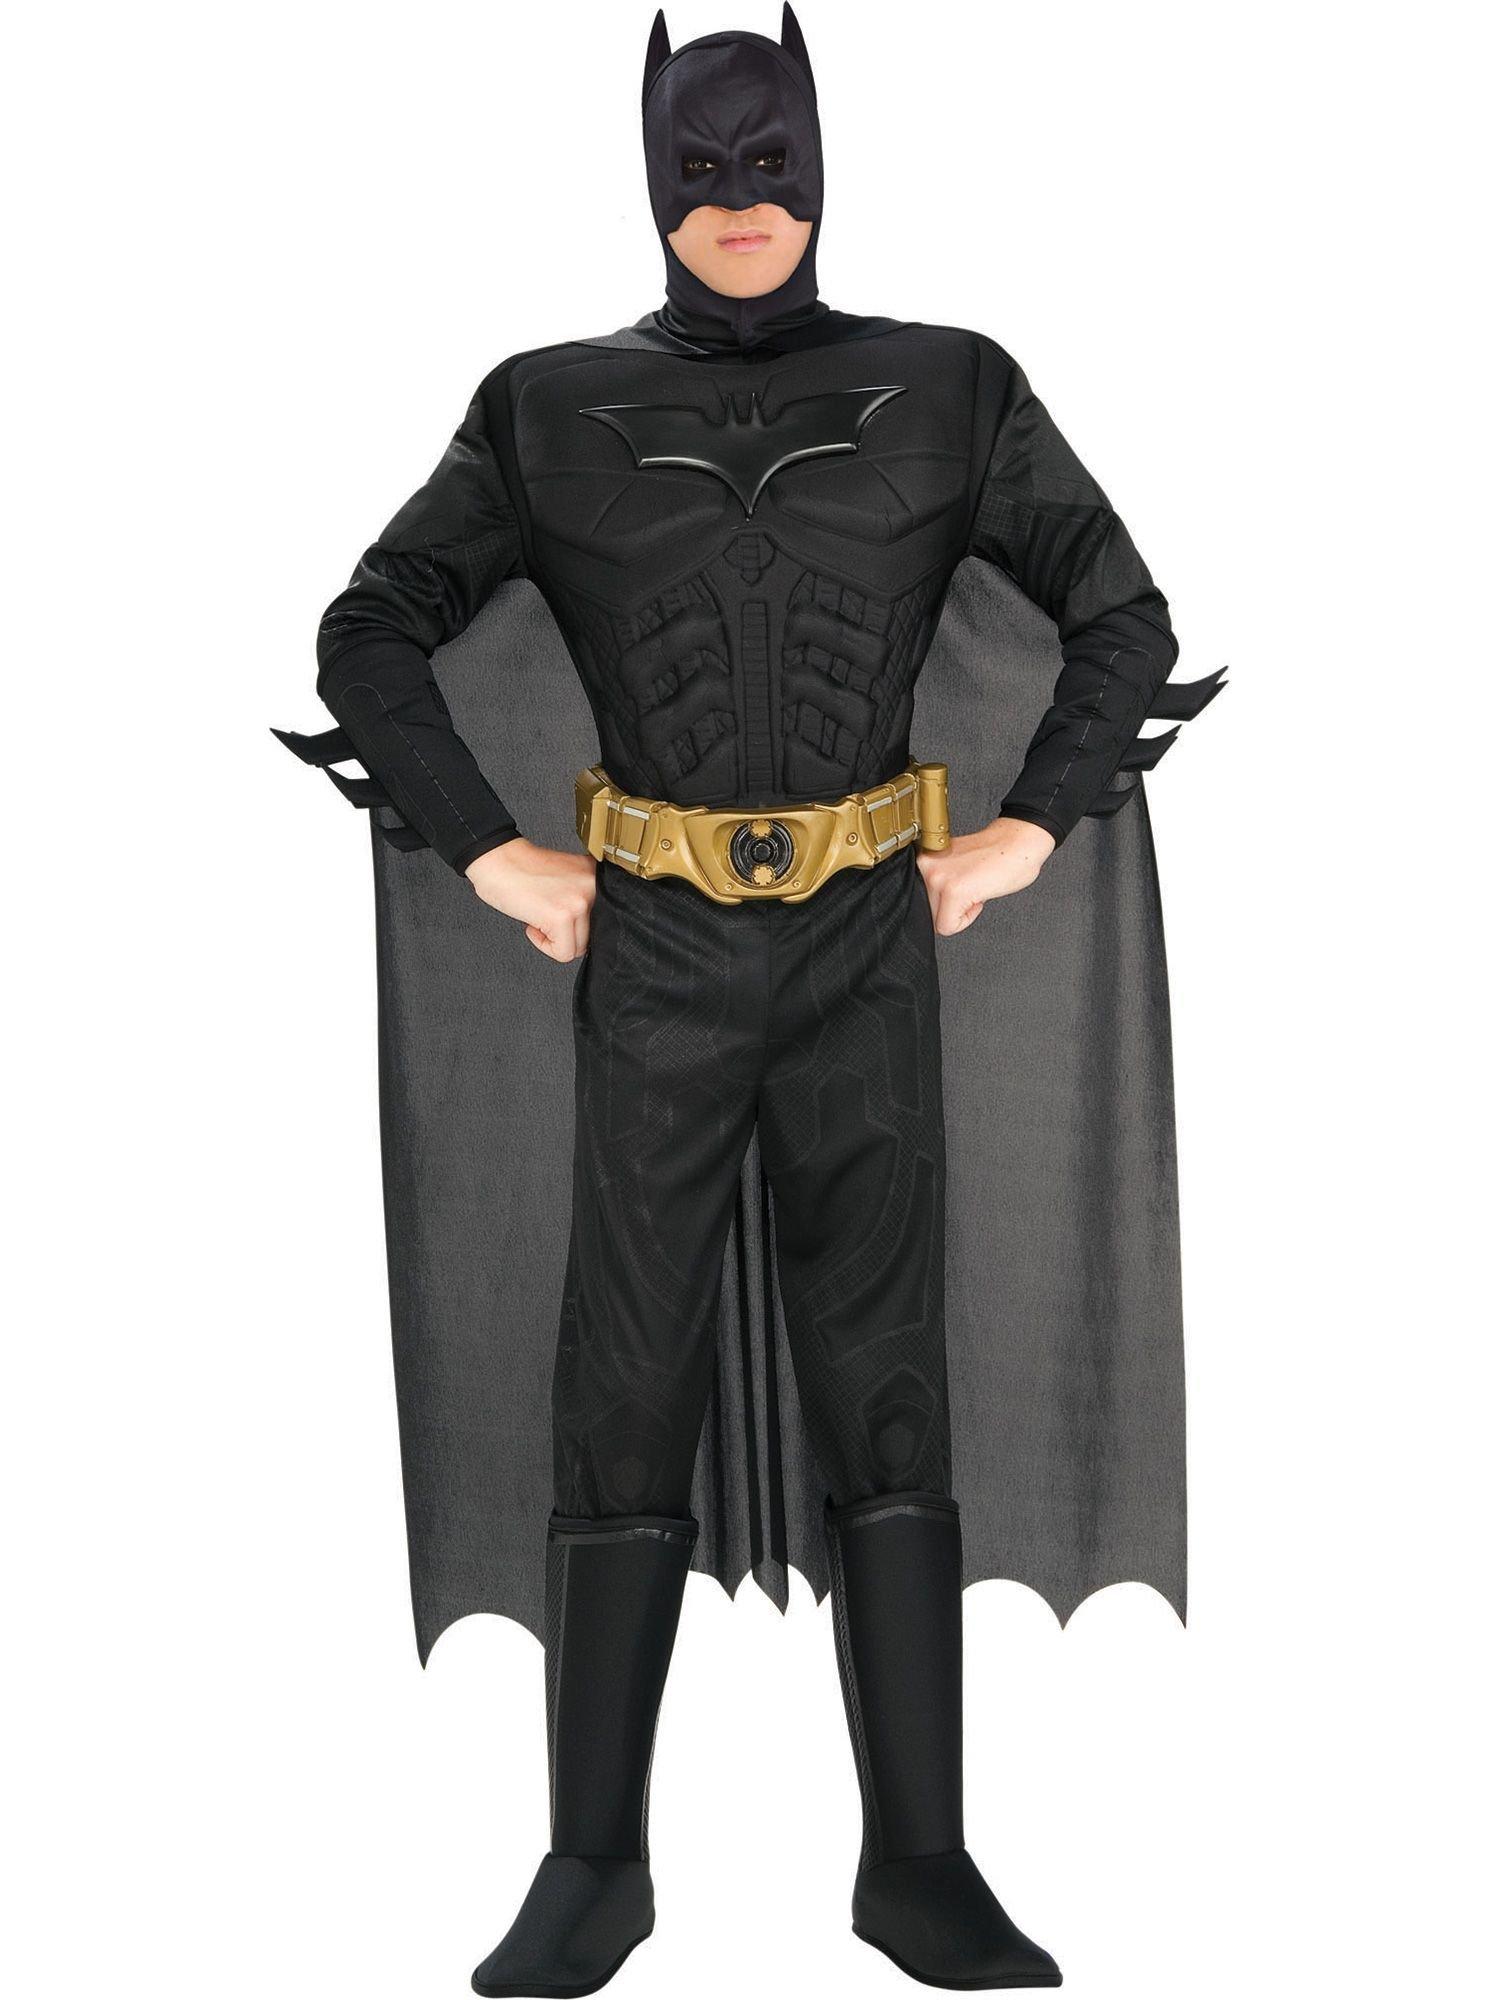 Batman The Dark Knight Rises Adult Batman Costume, Black, Large